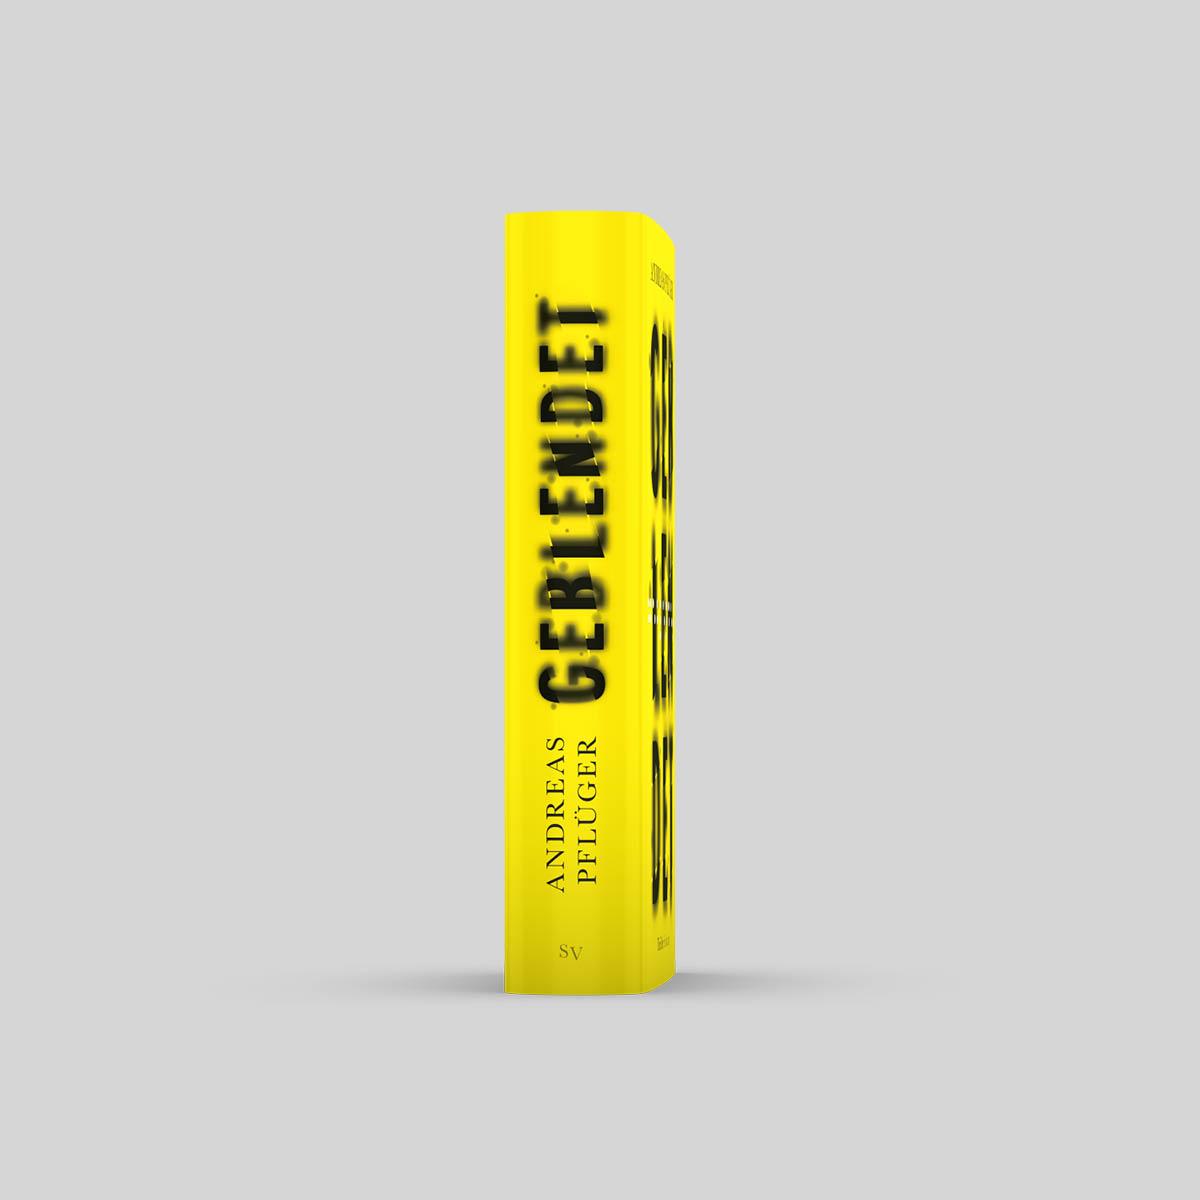 Pflueger_Geblendet_3D02